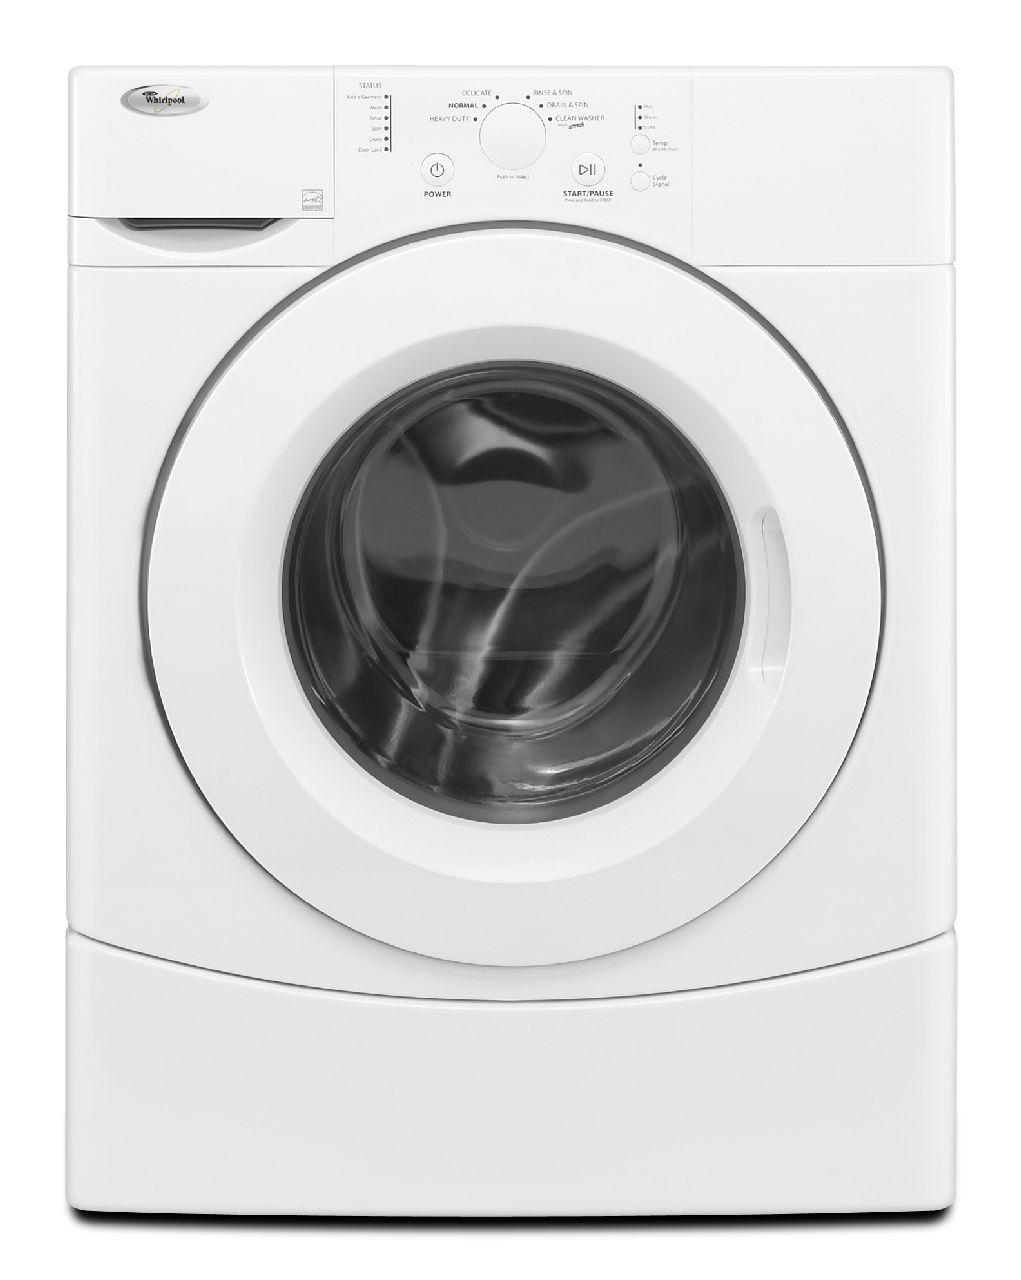 Whirlpool Washing Machine Model WFW9050XW01 Parts